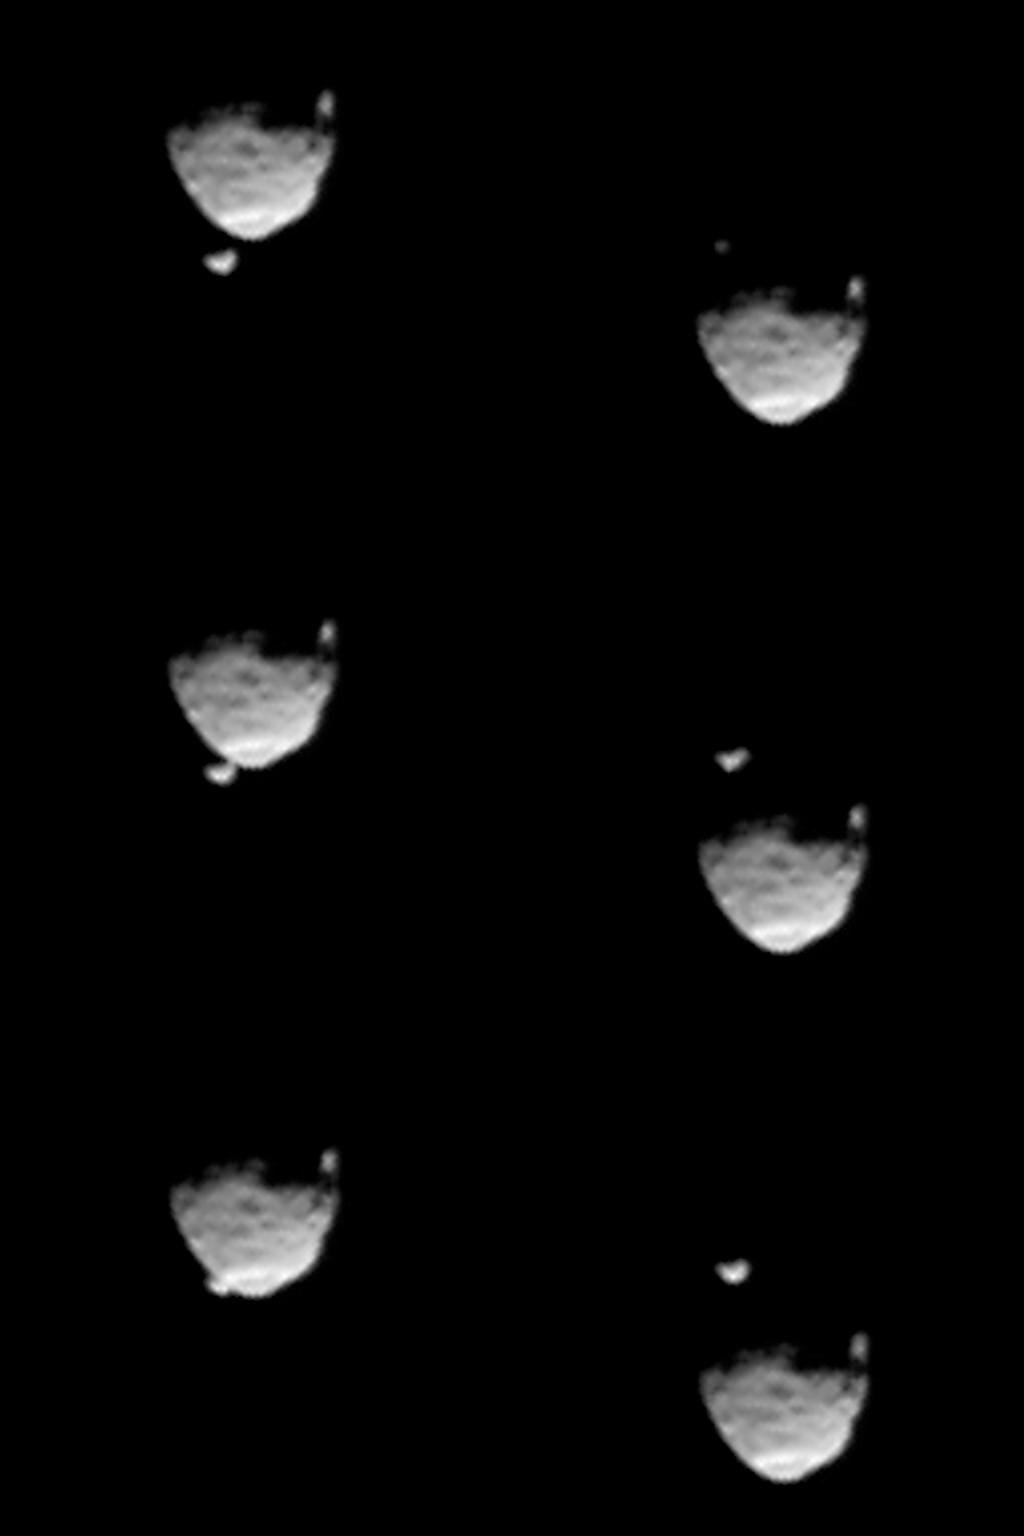 Moons of Mars: Amazing Photos of Phobos and Deimos